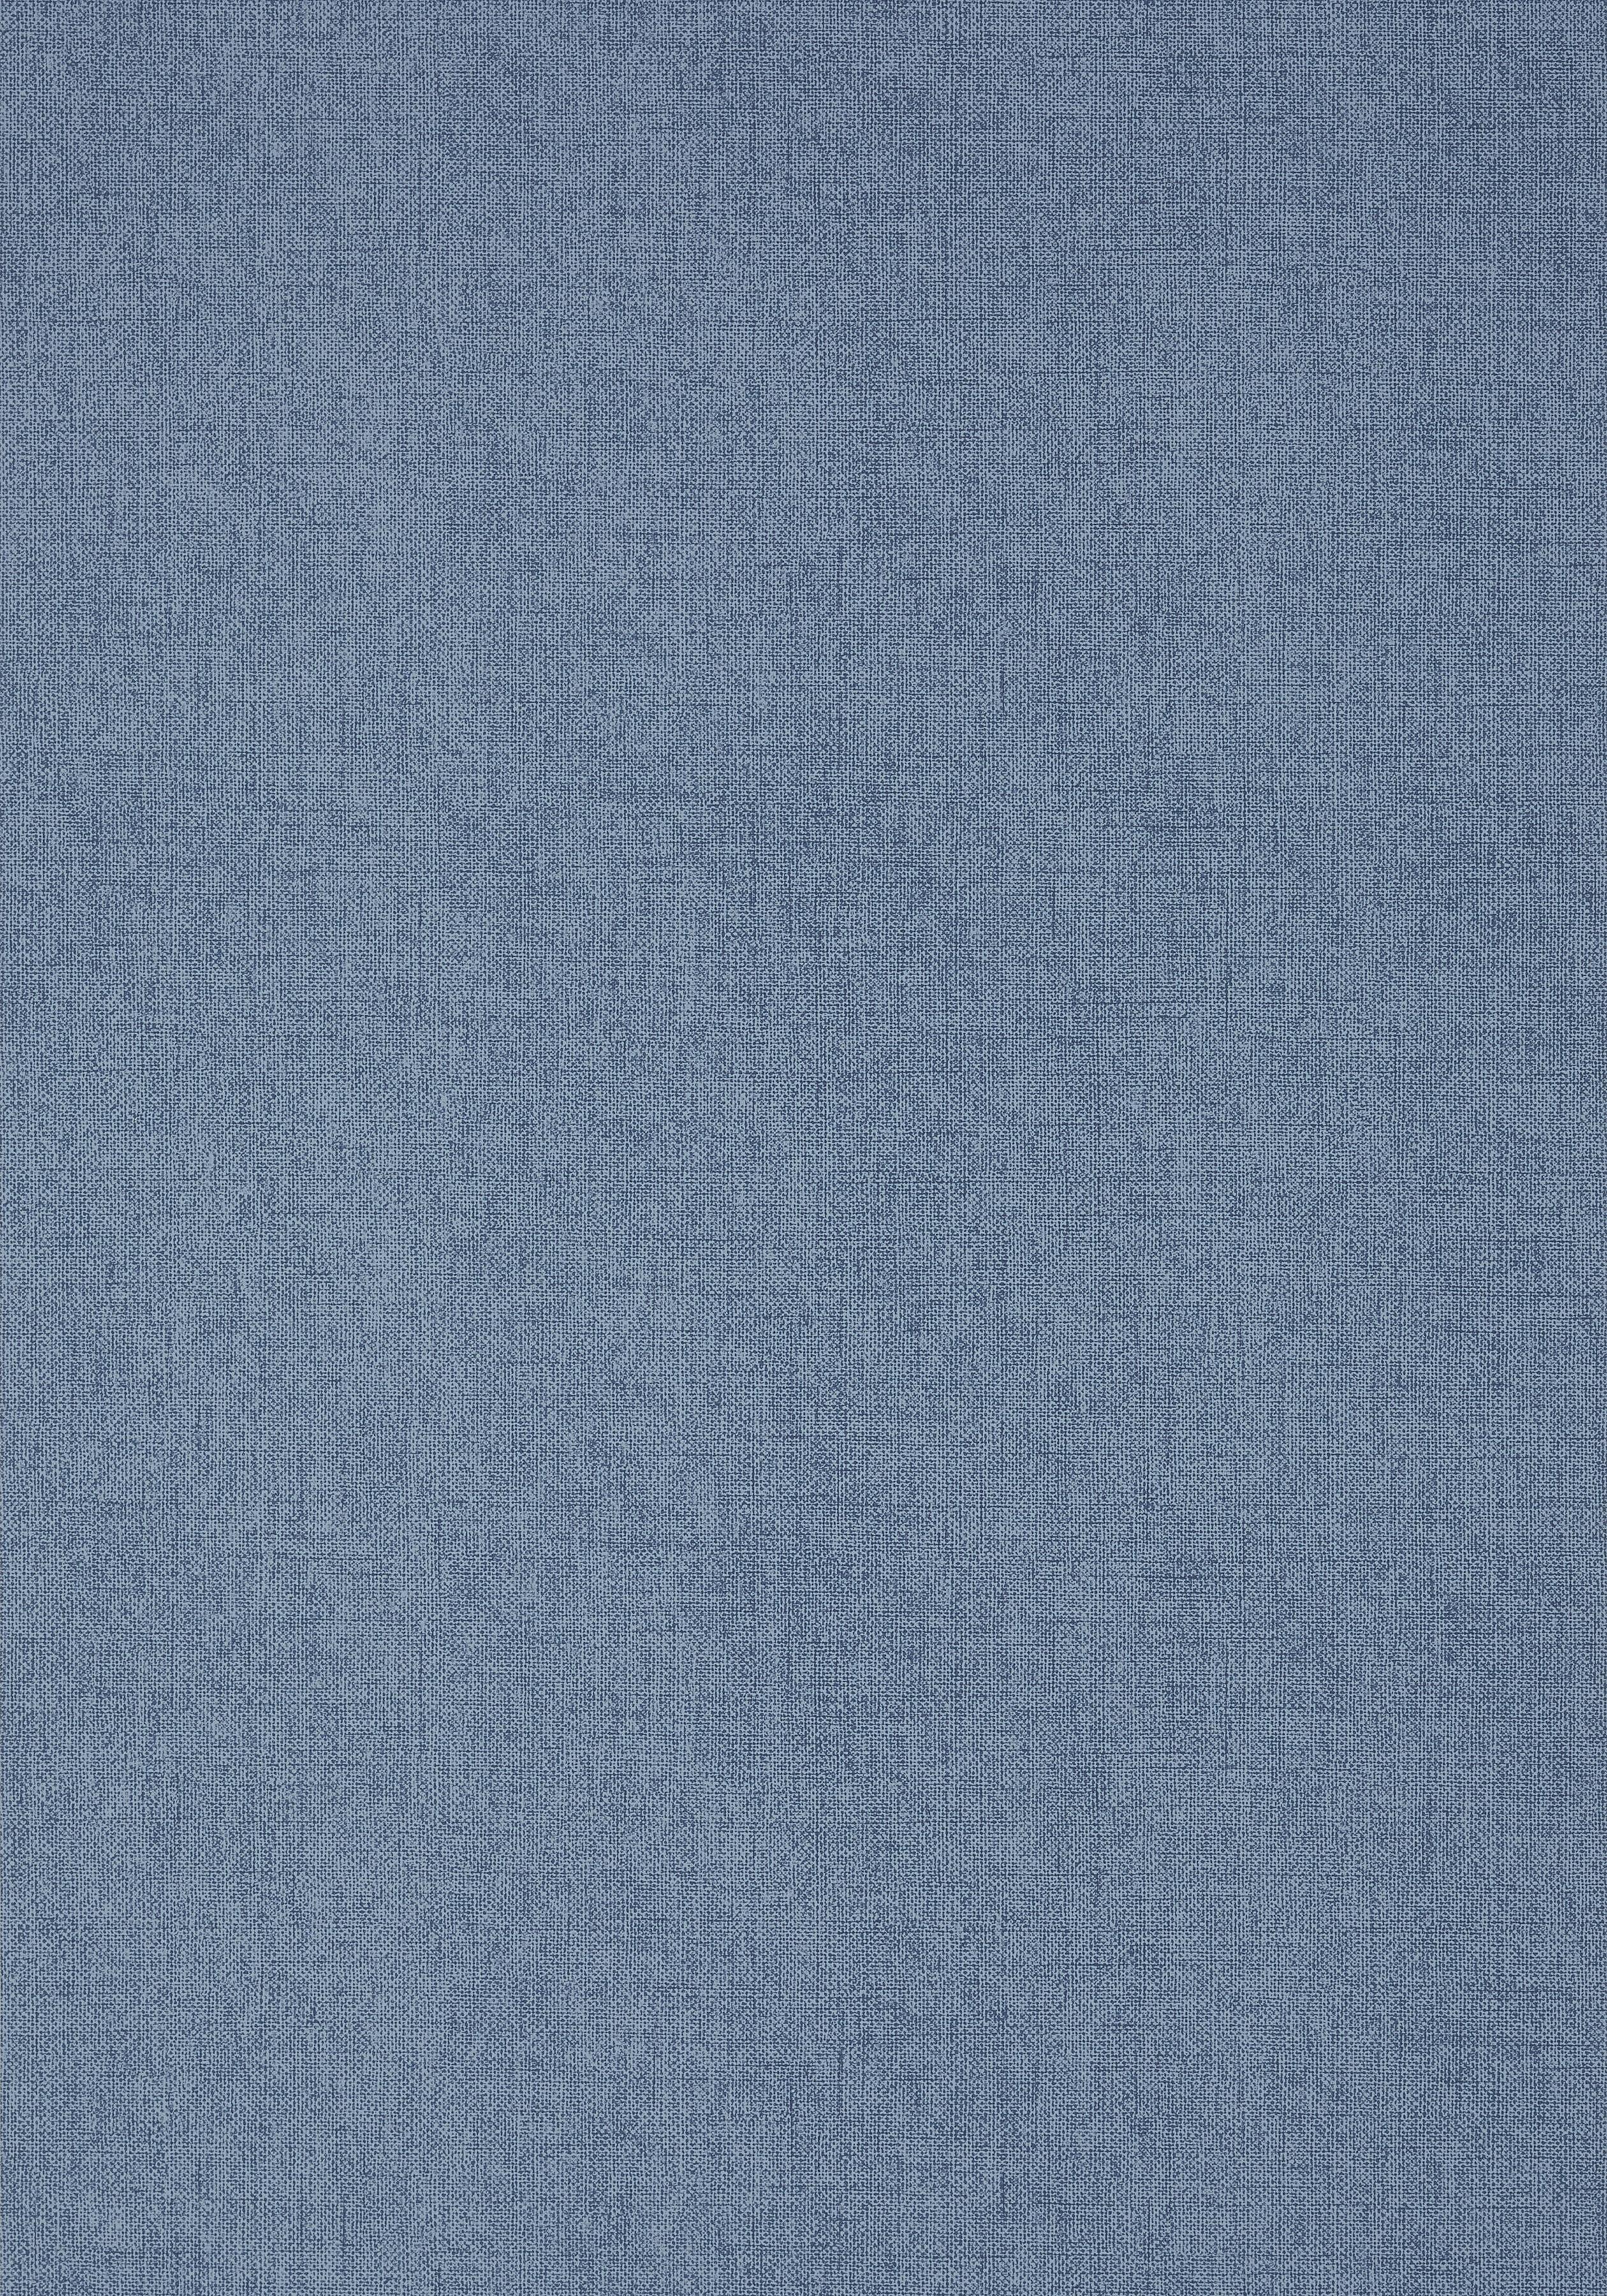 T14277 Blue Fabric Texture Fabric Wallpaper Fabric Textures